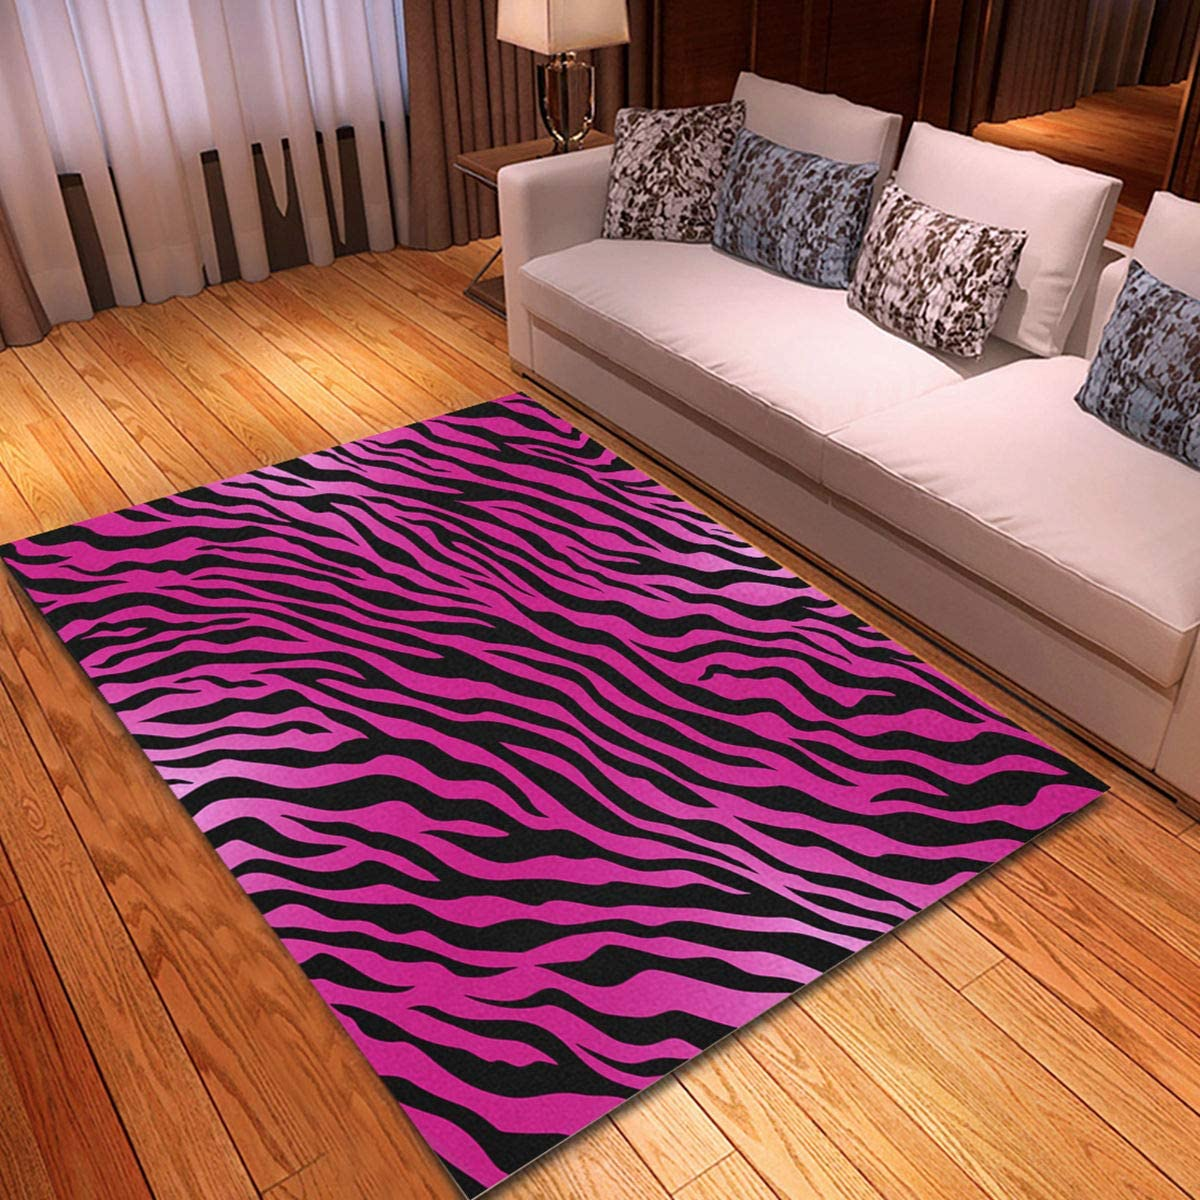 rouihot Non-Slip Area Rug 2'x 3' Orange Tiger Pink Animal Skin Zebra Pattern Black Wild Rugs Carpet for Classroom Living Room Bedroom Dining Kindergarten Room